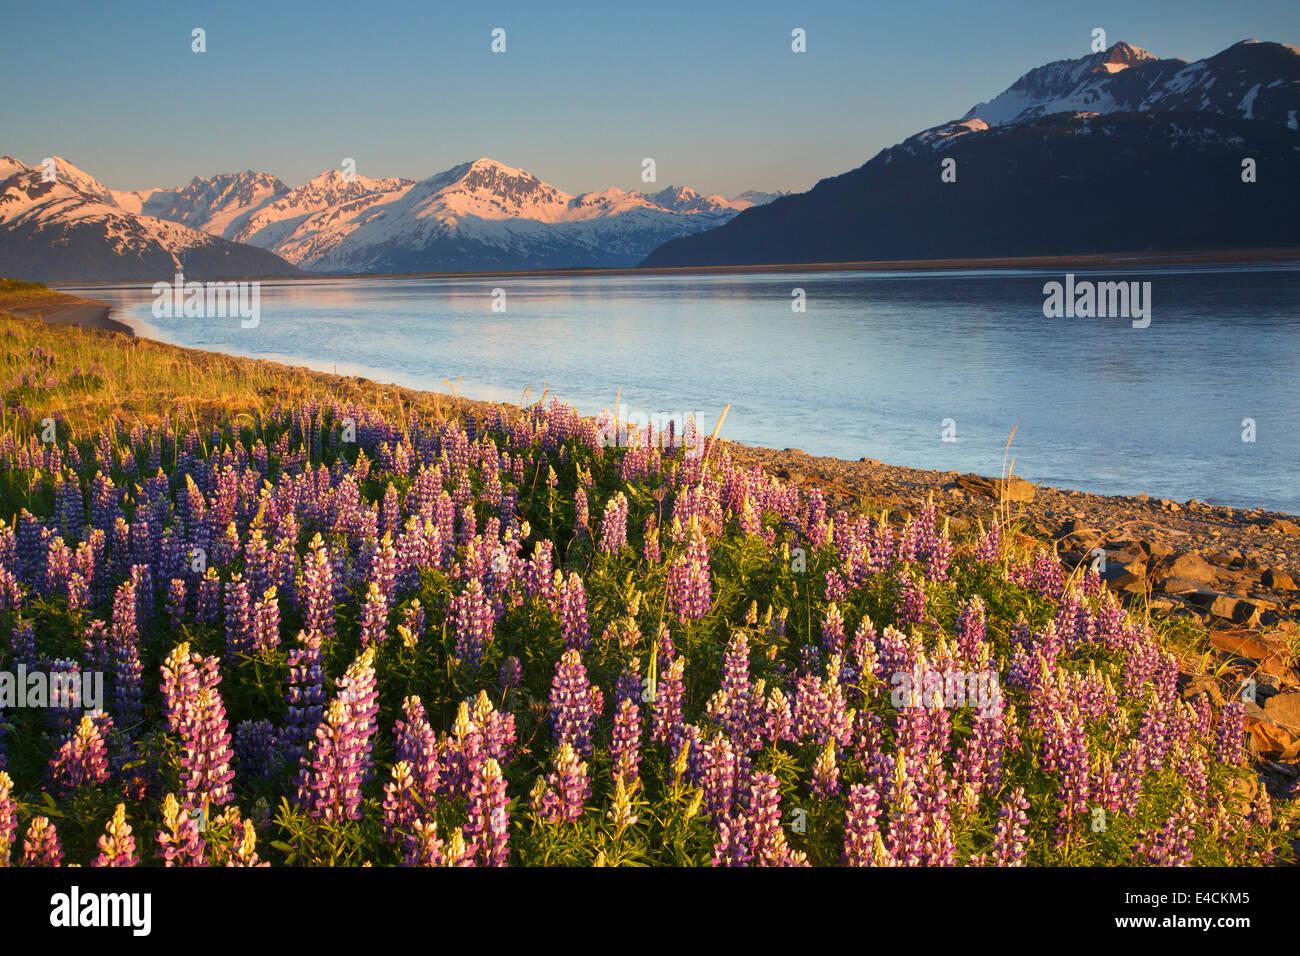 A field of lupine along Turnagain Arm, Chugach National Forest, Alaska. - Stock Image